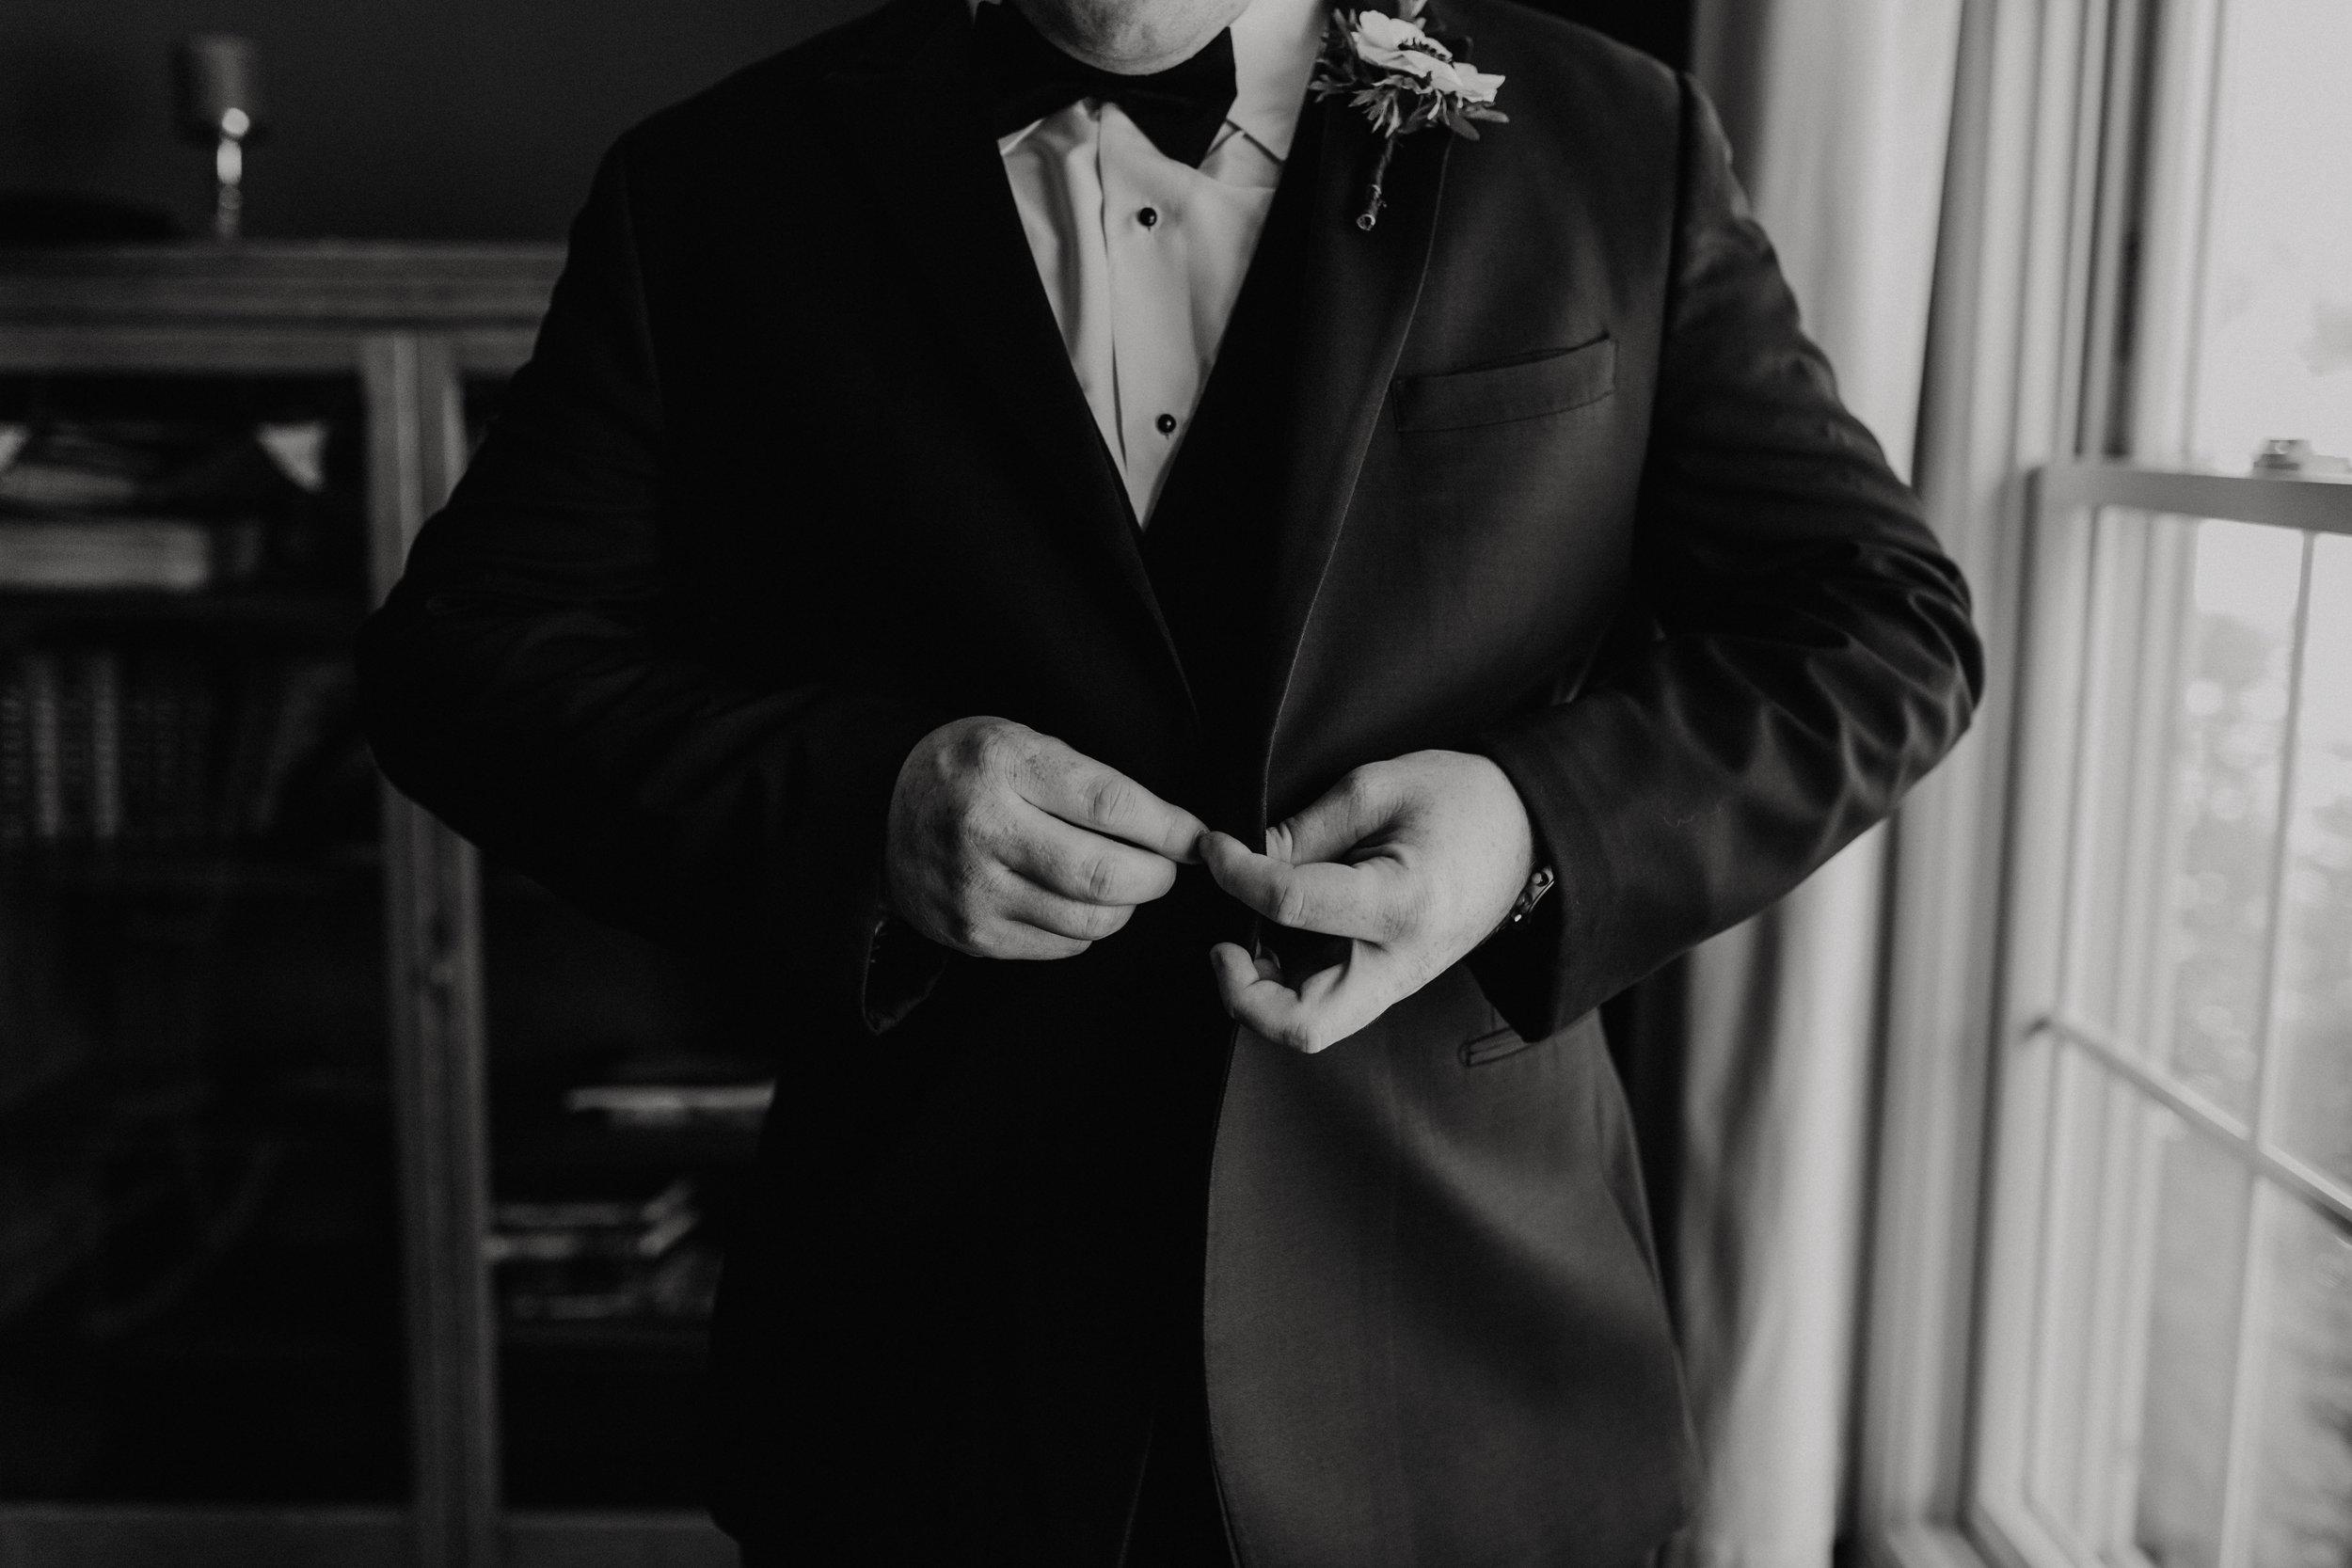 albany-new-york-wedding-3.jpg